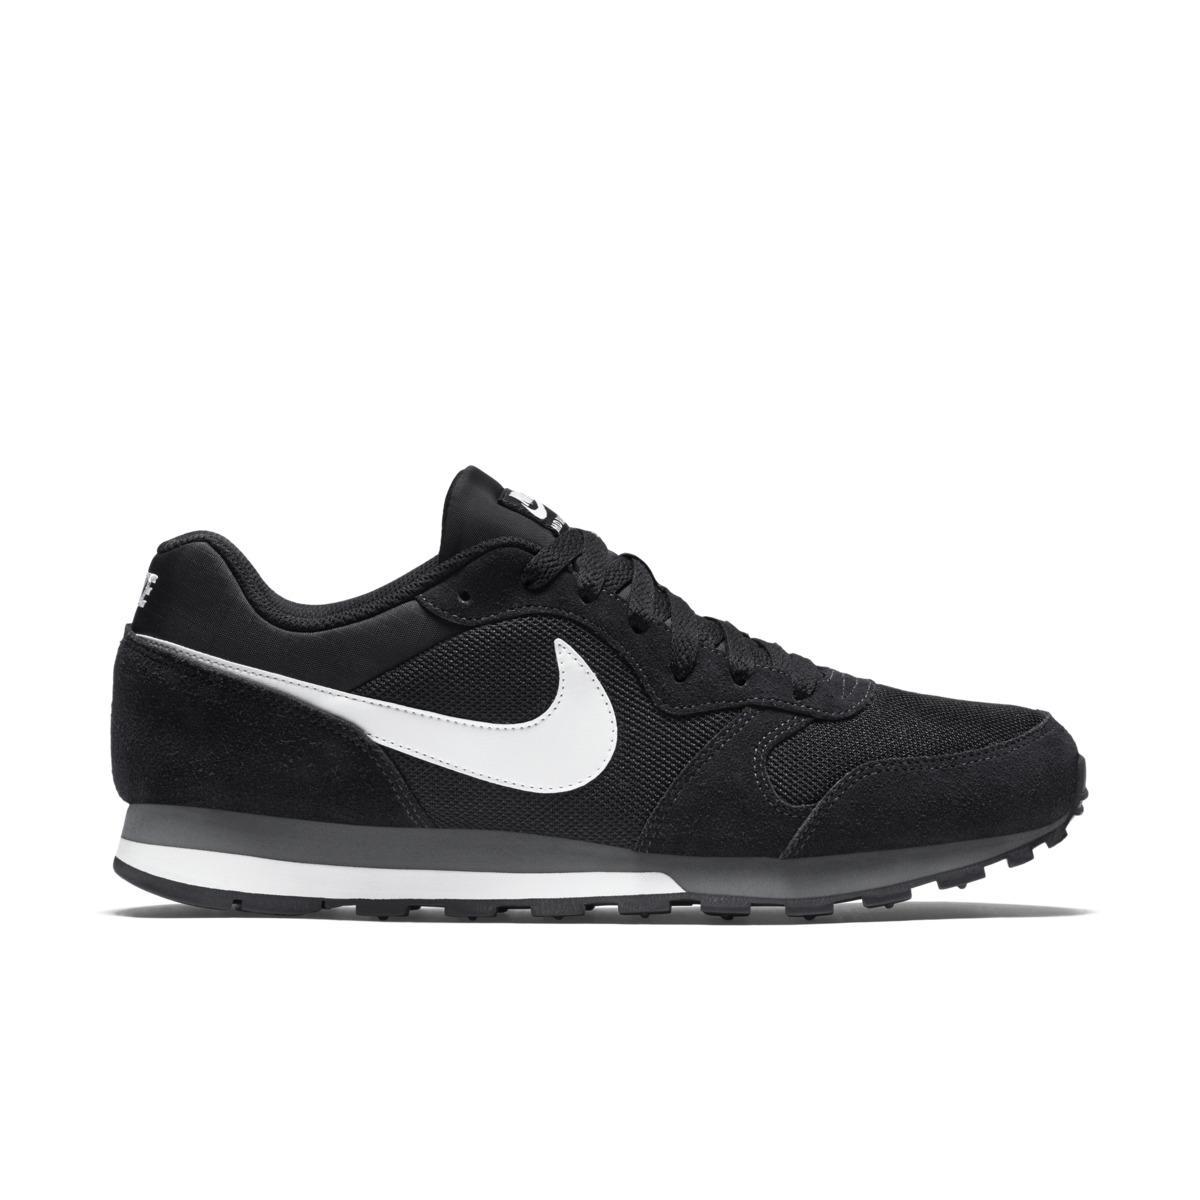 Nike. Men's Black Md Runner 2 Casualwear Trainers. £58 + £15.00 shipping  From El Corte Ingles